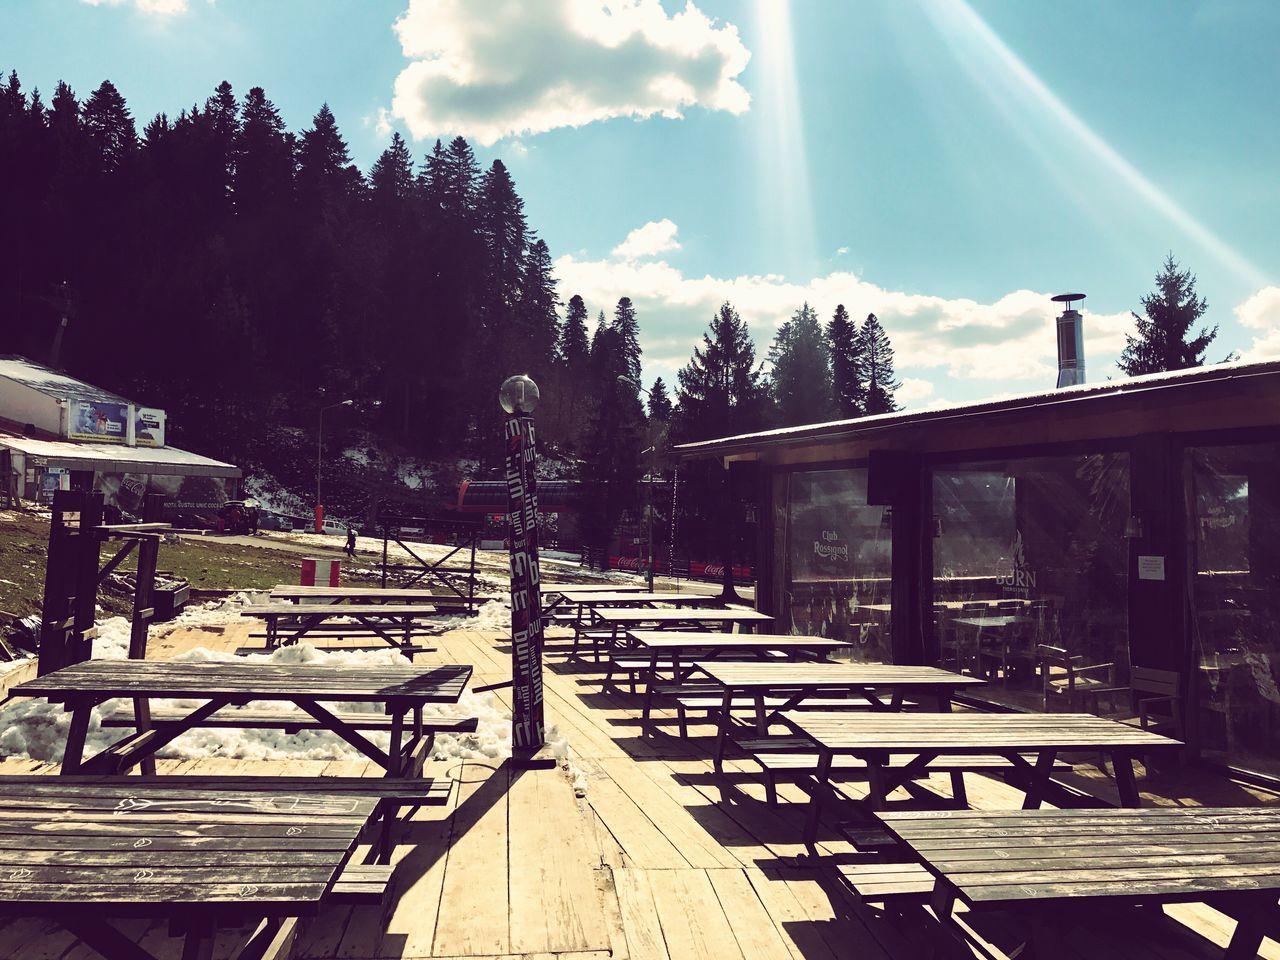 Apres Ski Lounge Empty